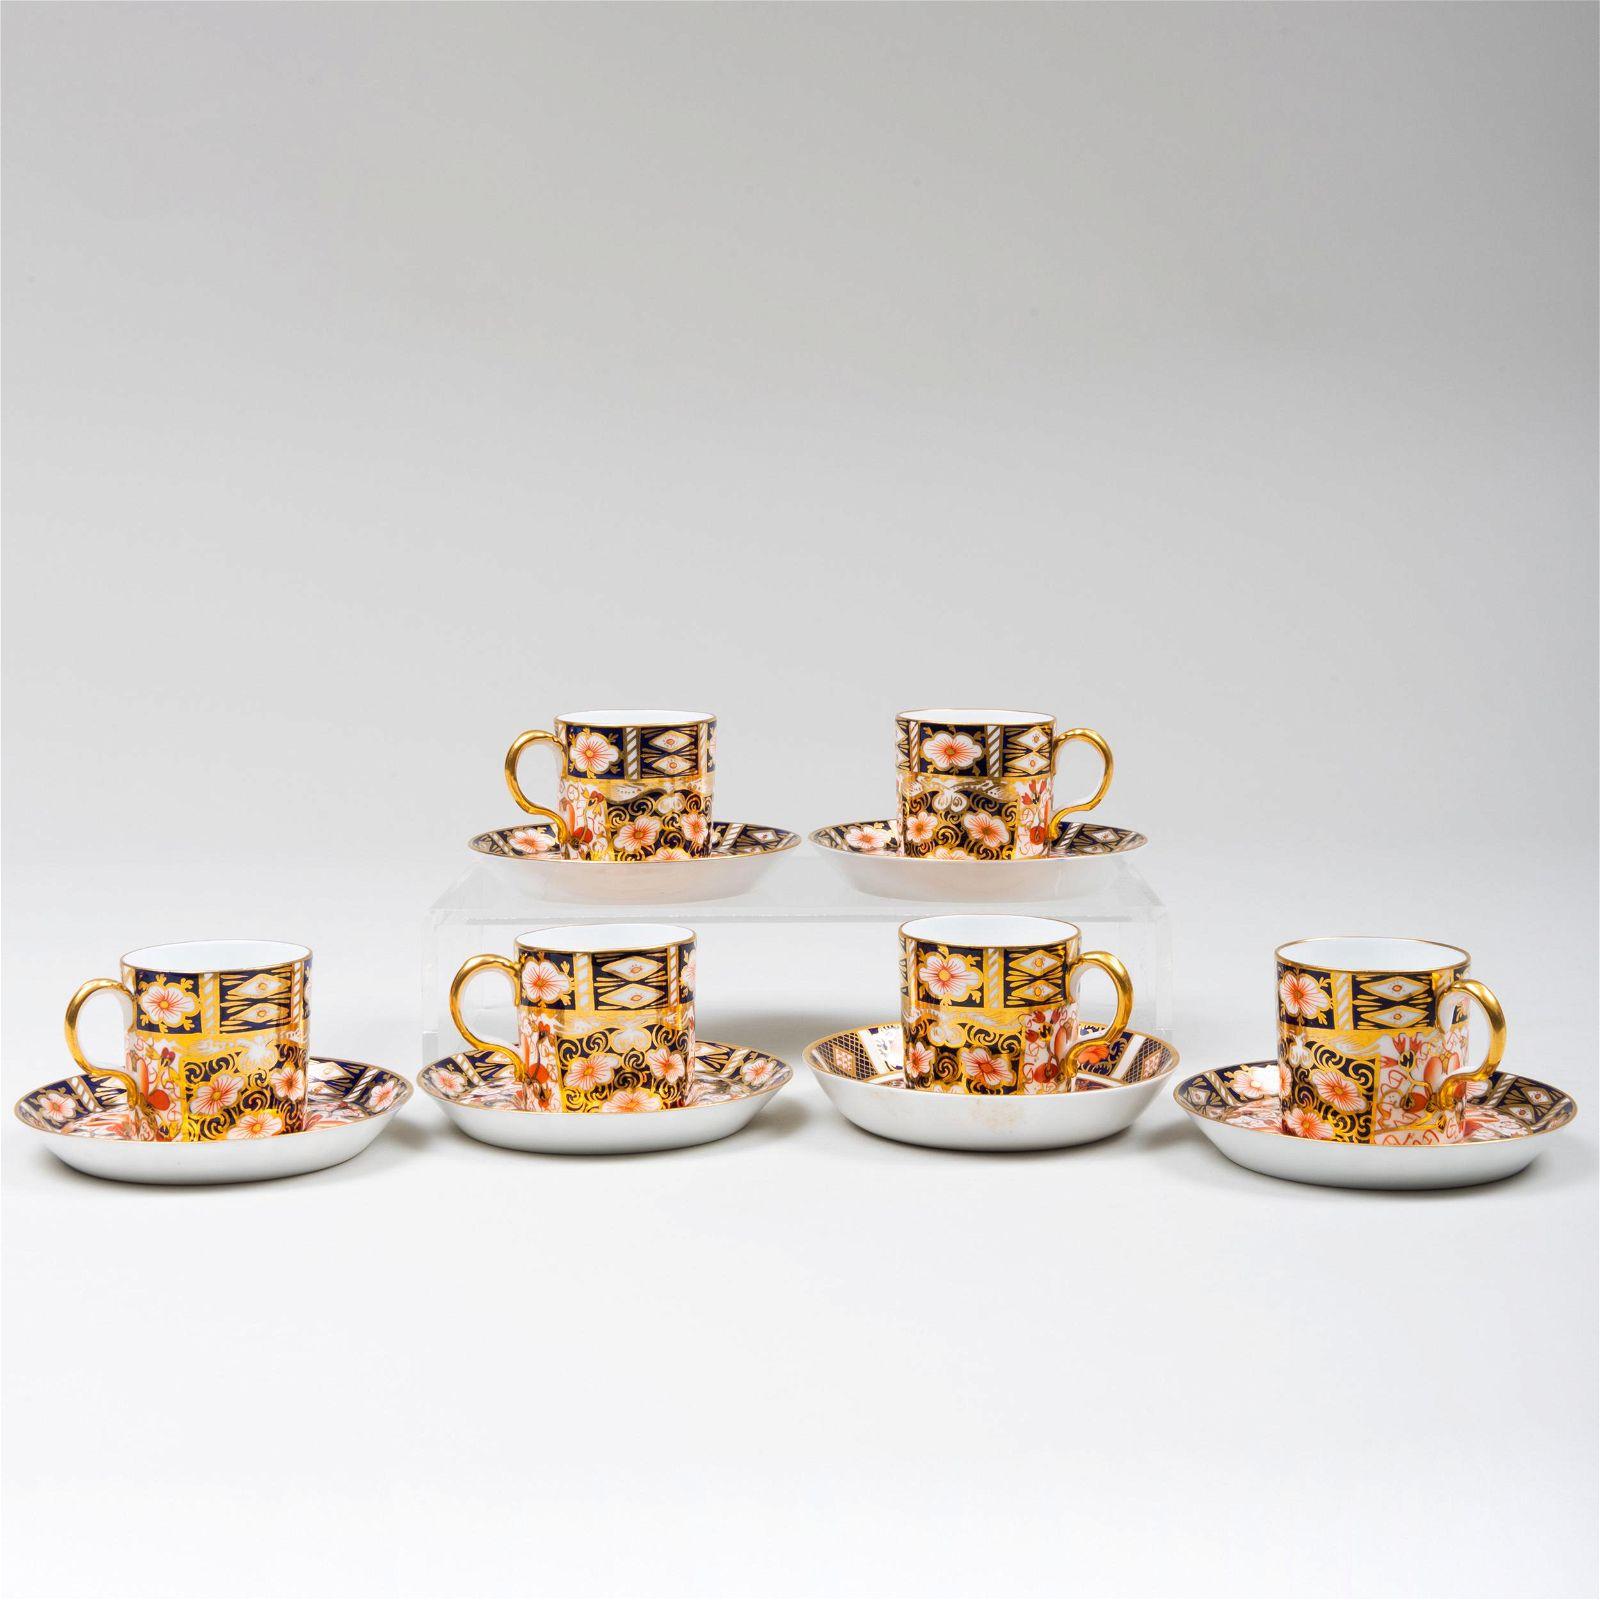 Set of Royal Crown Derby Porcelain 'Imari' Patterns